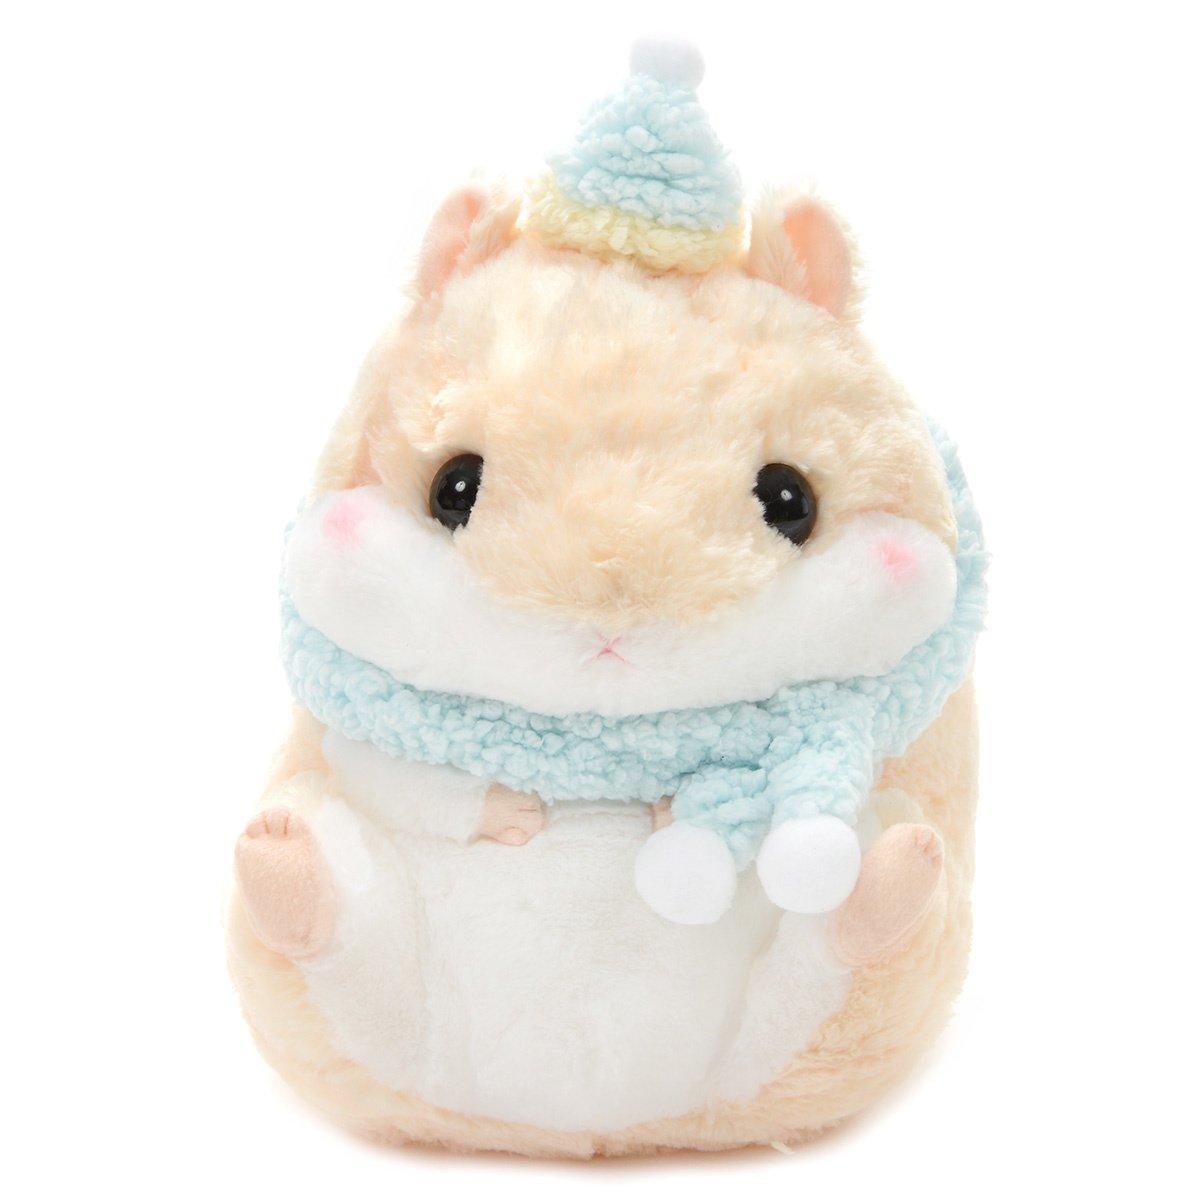 Hamster Plush Doll Amuse Coroham Coron Moko Moko Plush Collection Purin Beige BIG